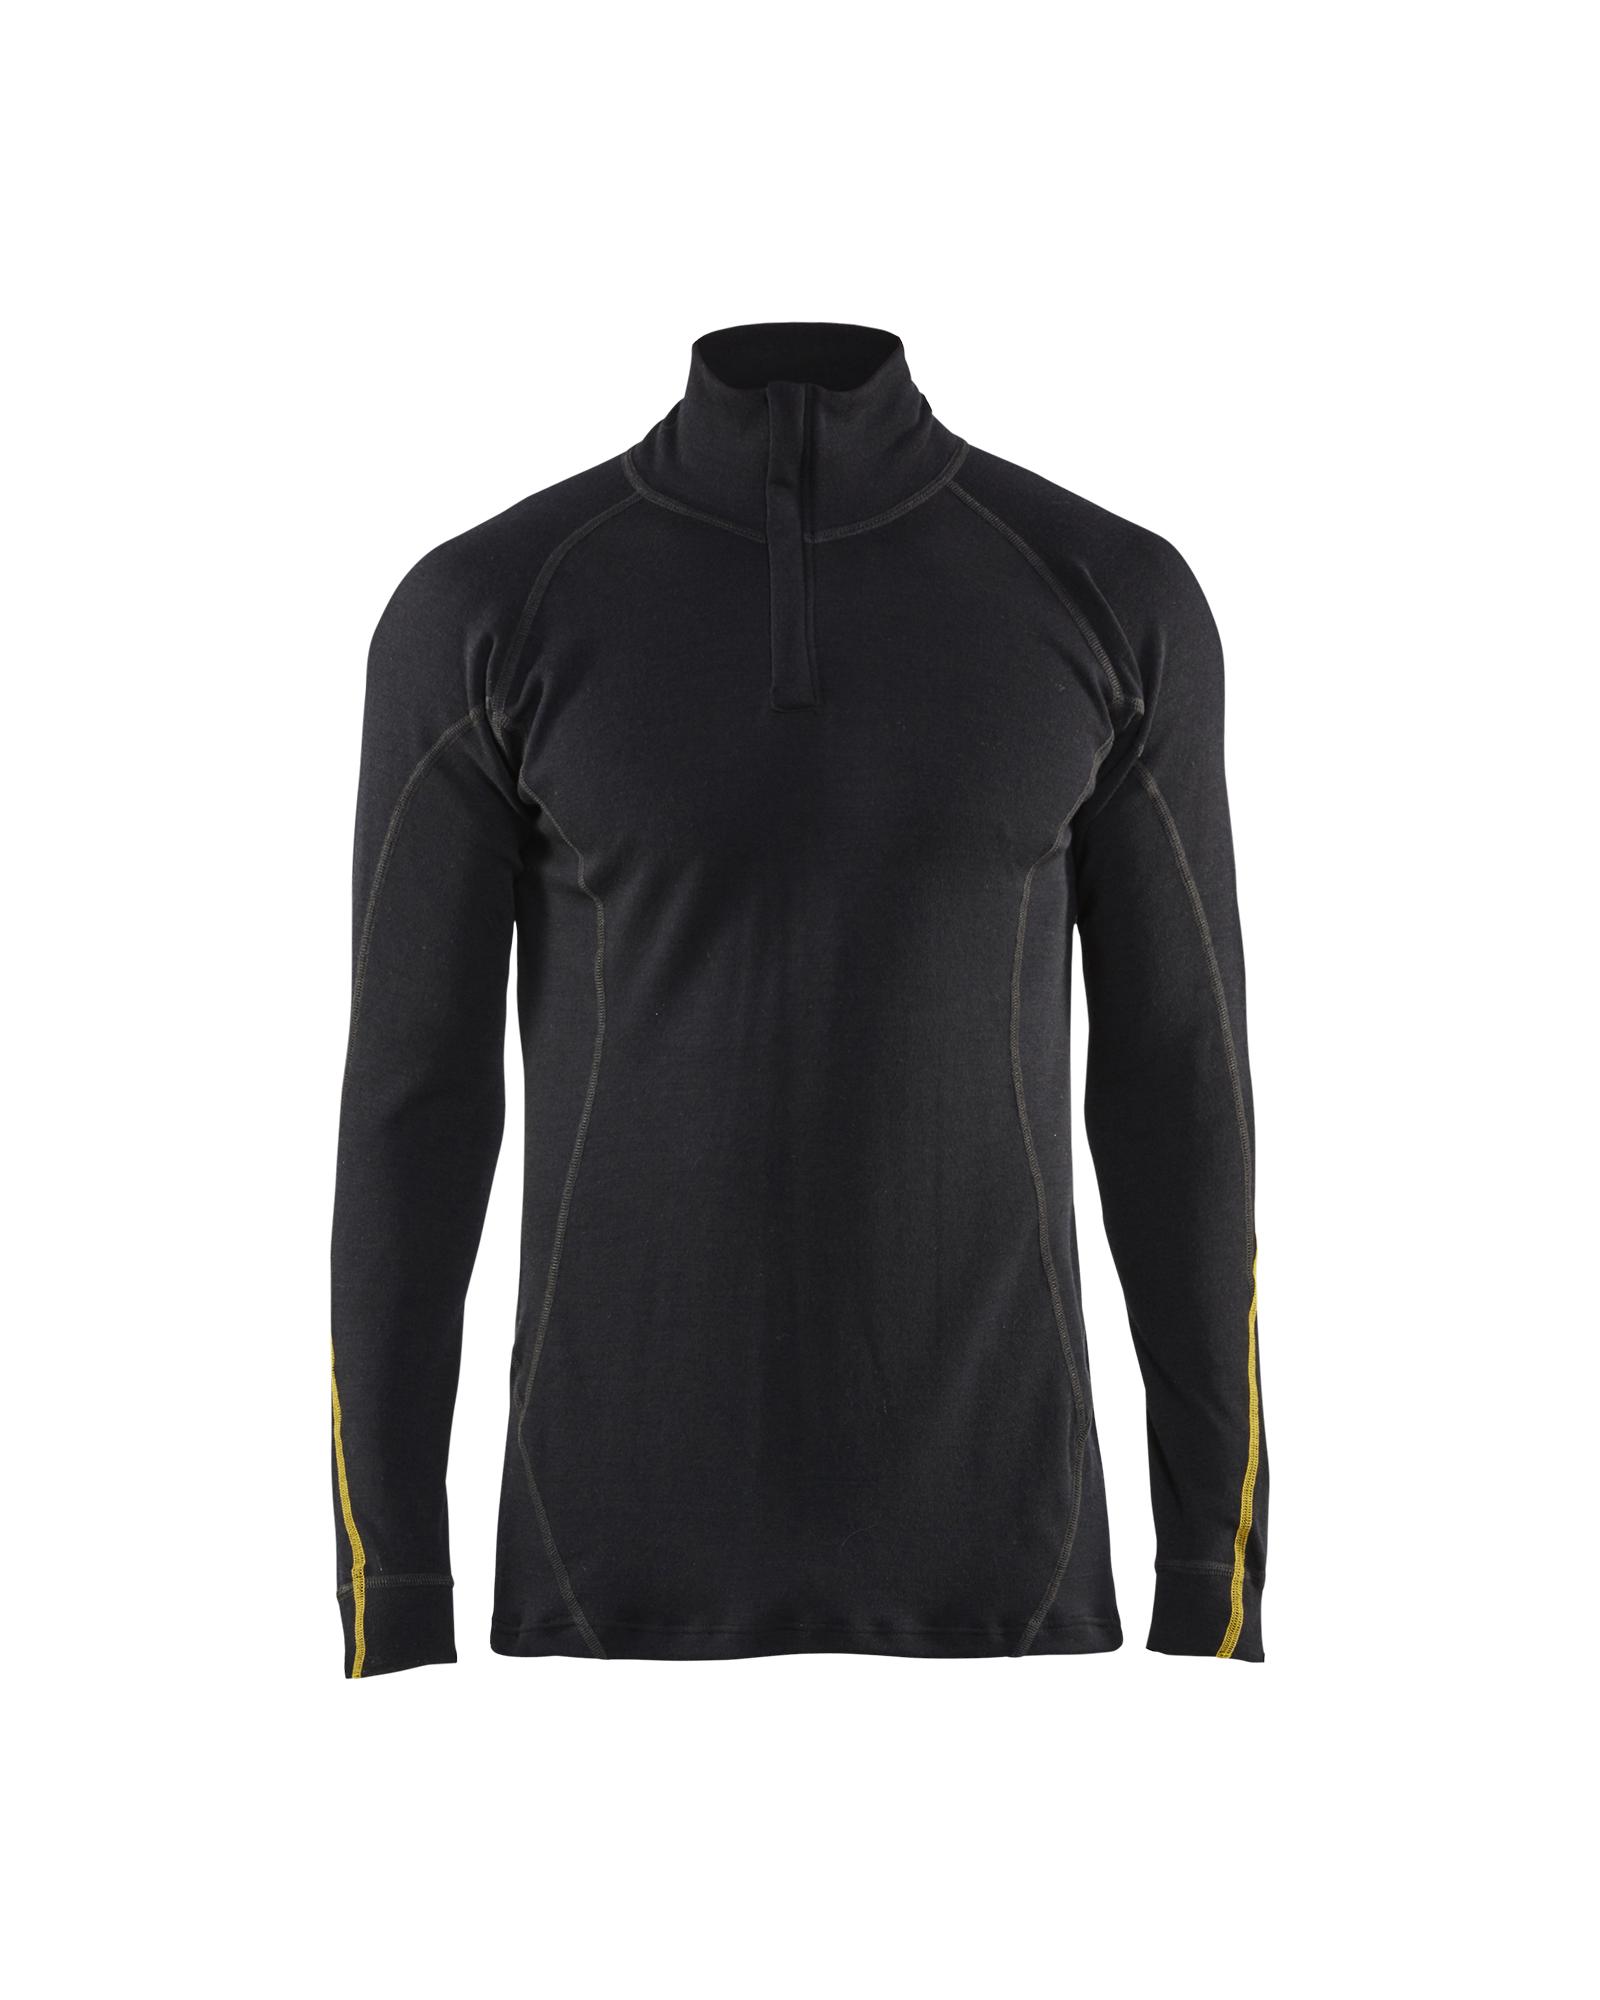 FR Onderhemd Zip-neck 78% Merino